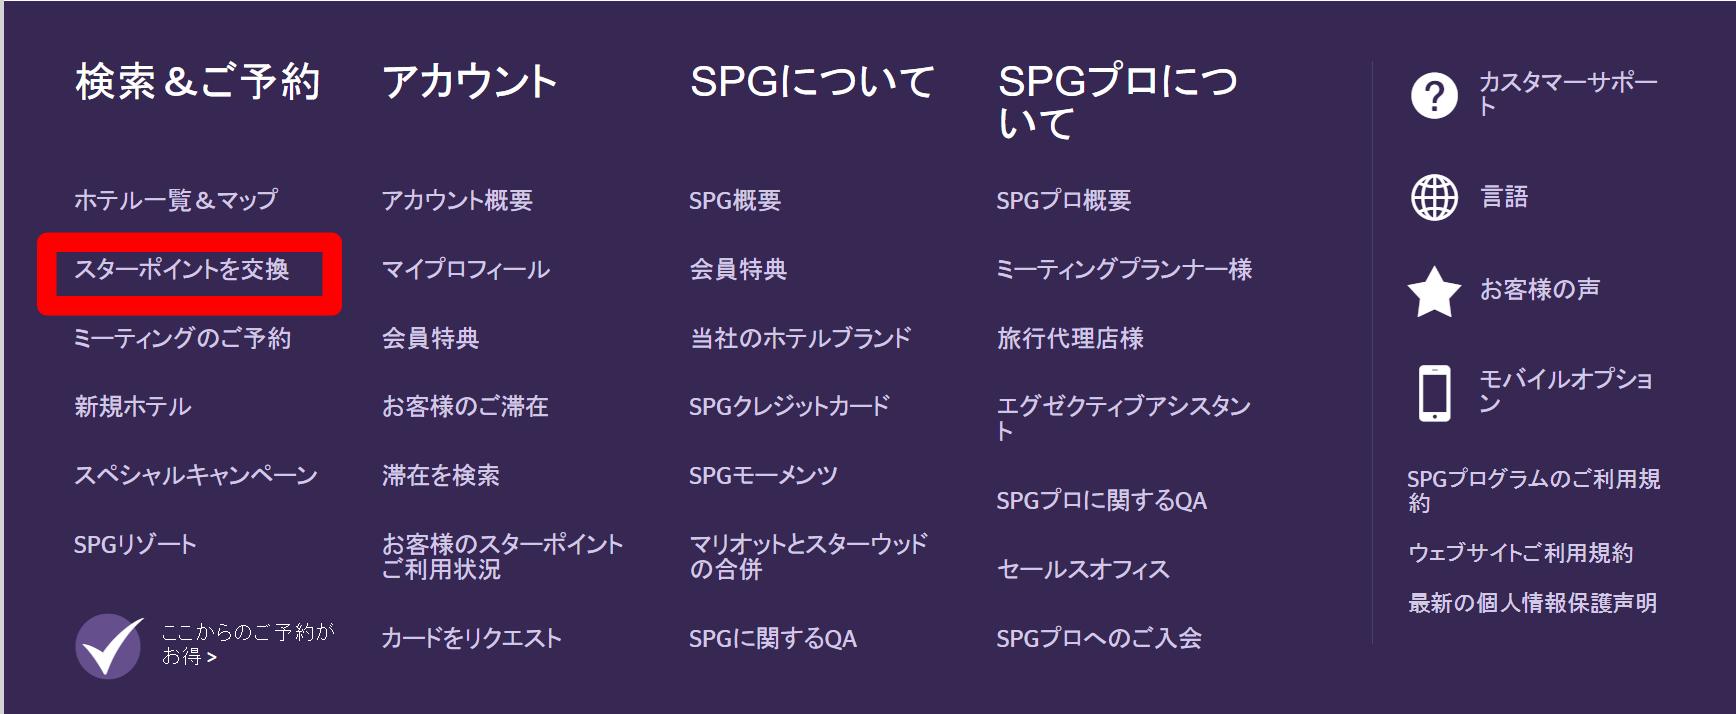 SPGアメックス スターポイント移行手順04